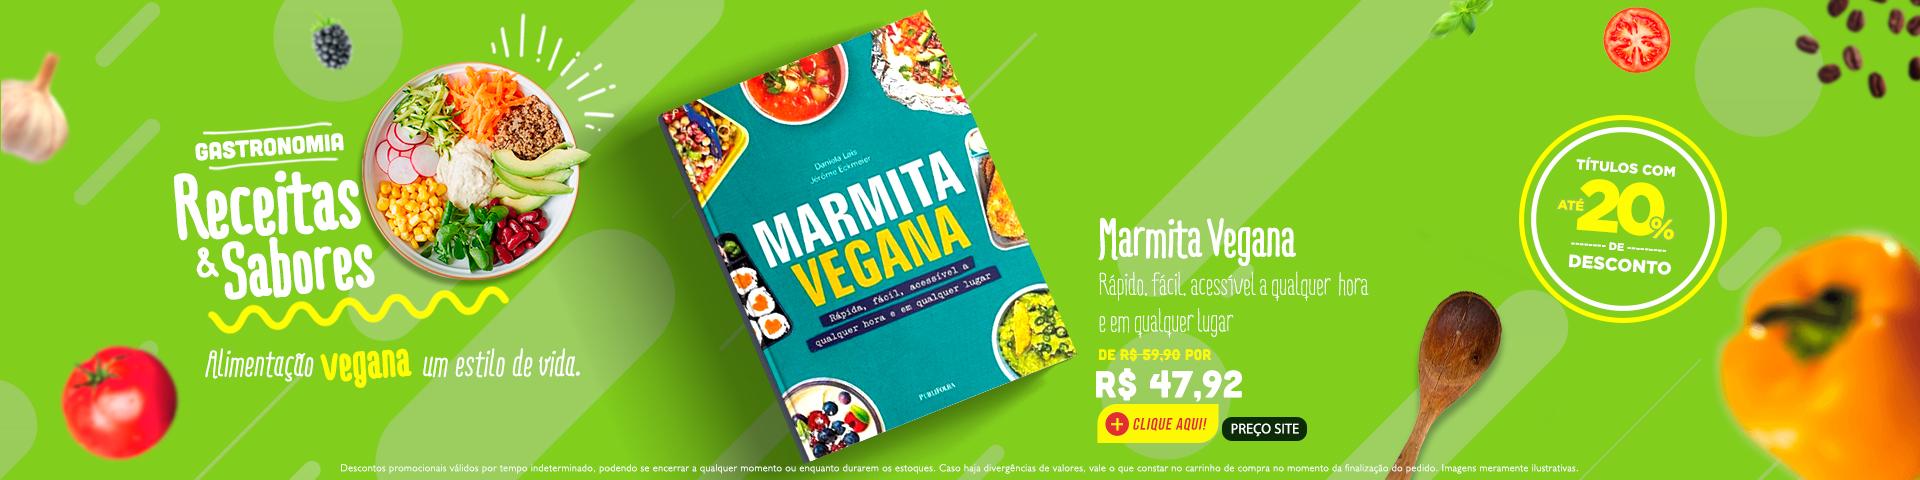 Gastronomia - Marmita Vegana